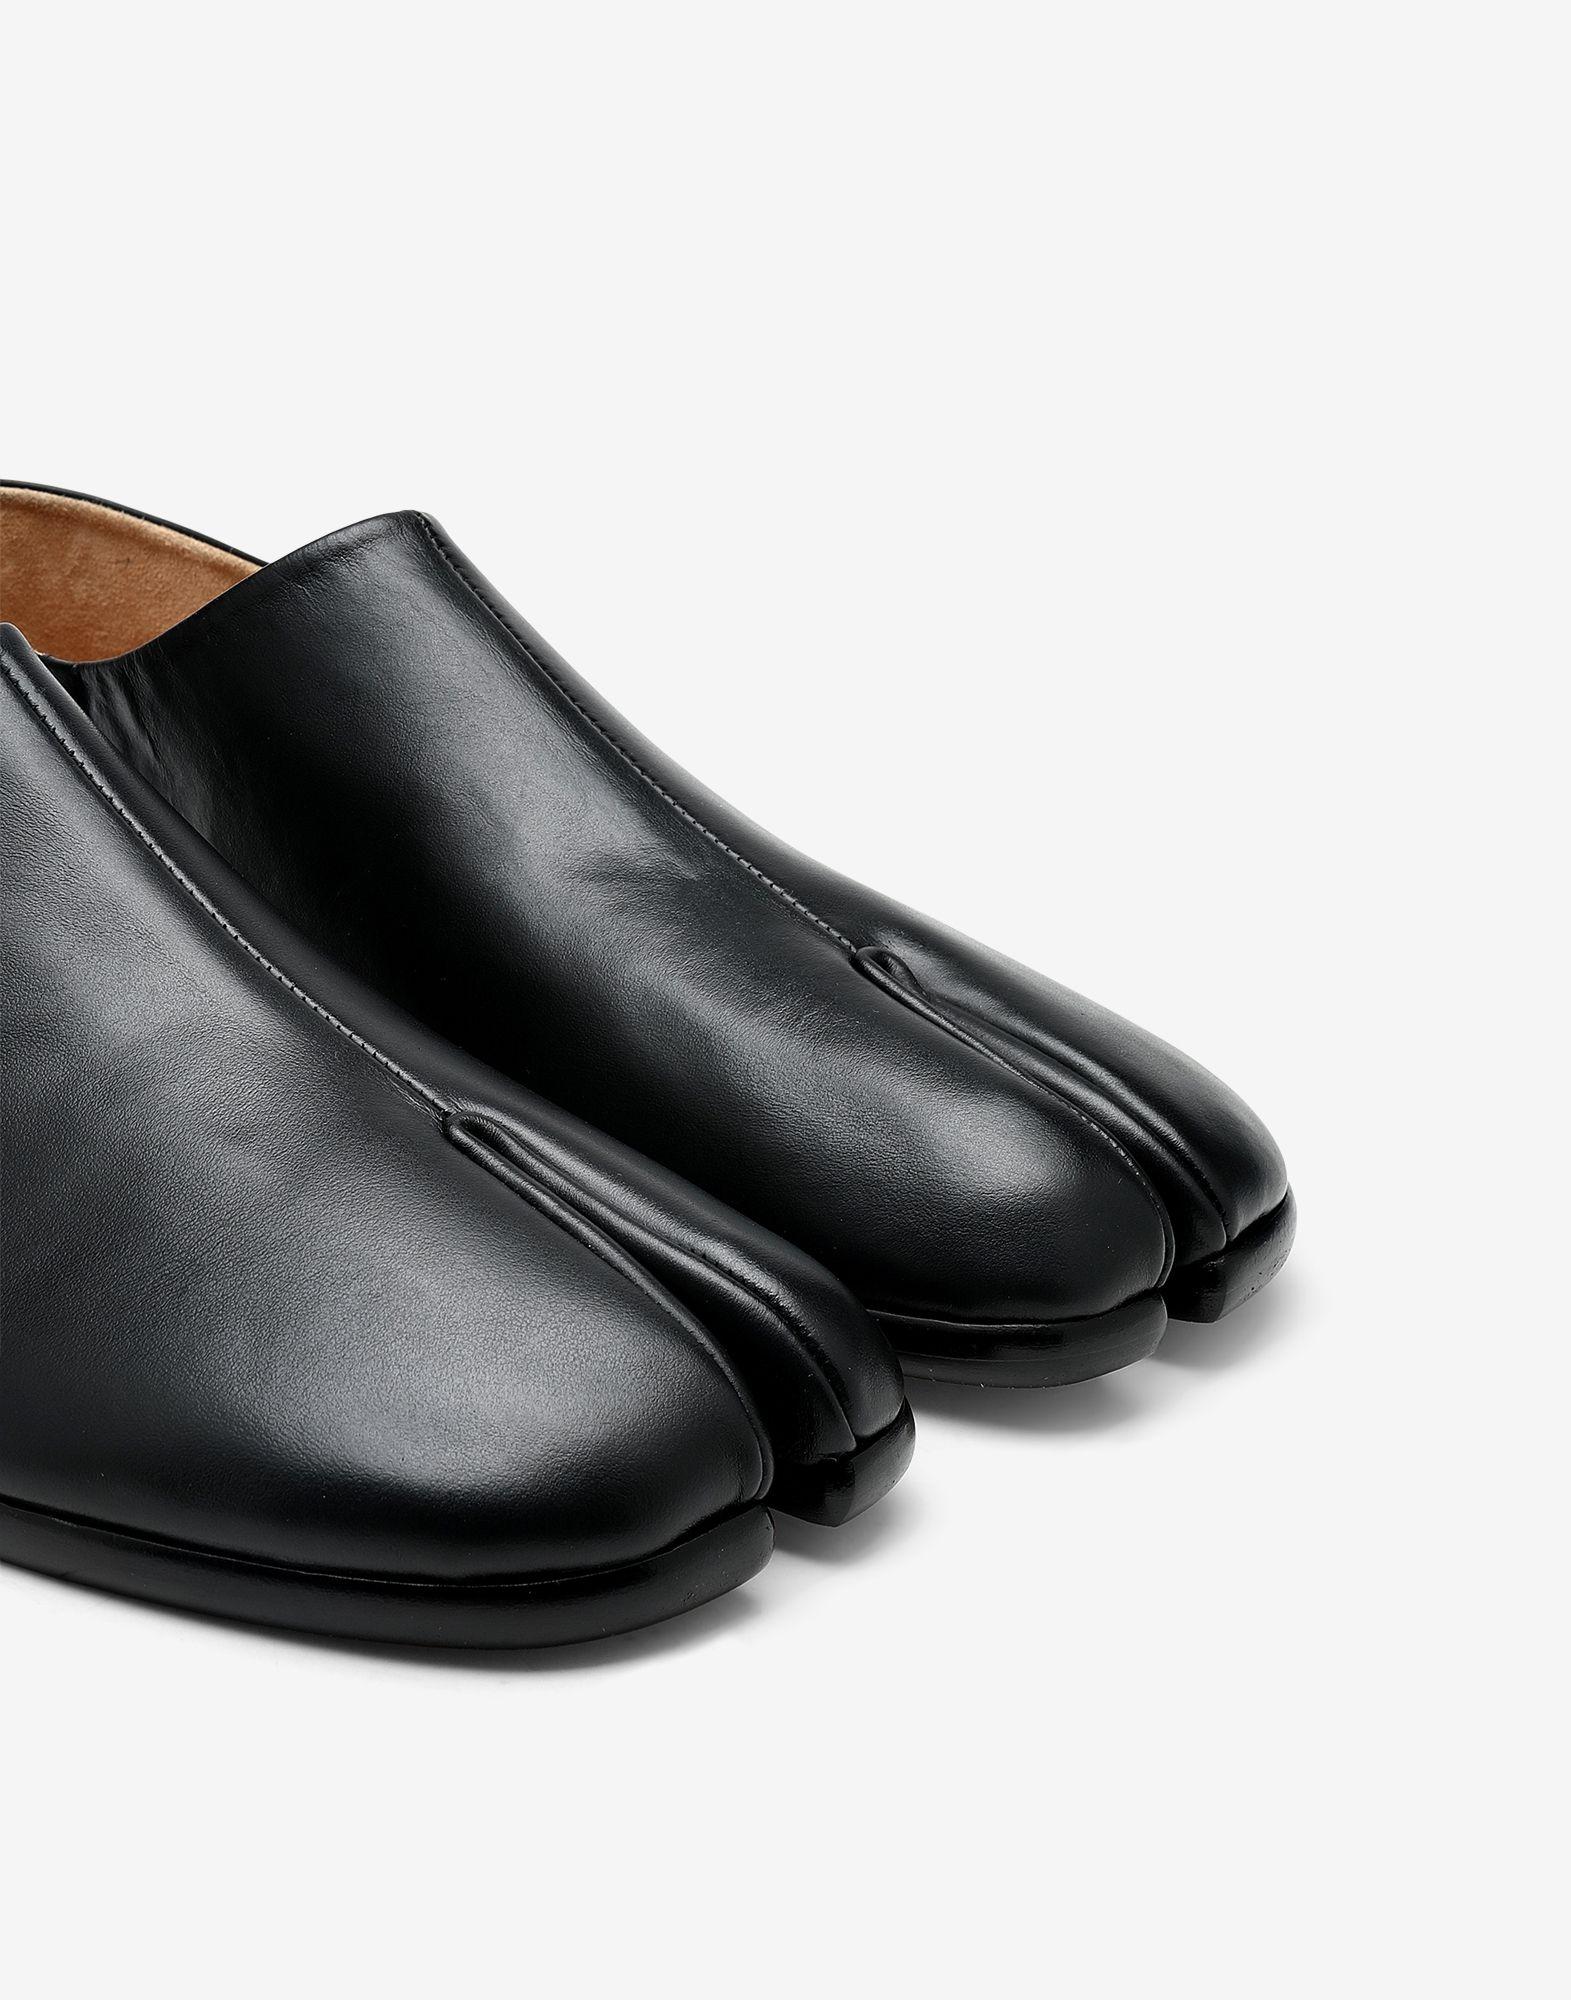 MAISON MARGIELA Tabi Slipper-Schuhe Mokassins Herr a